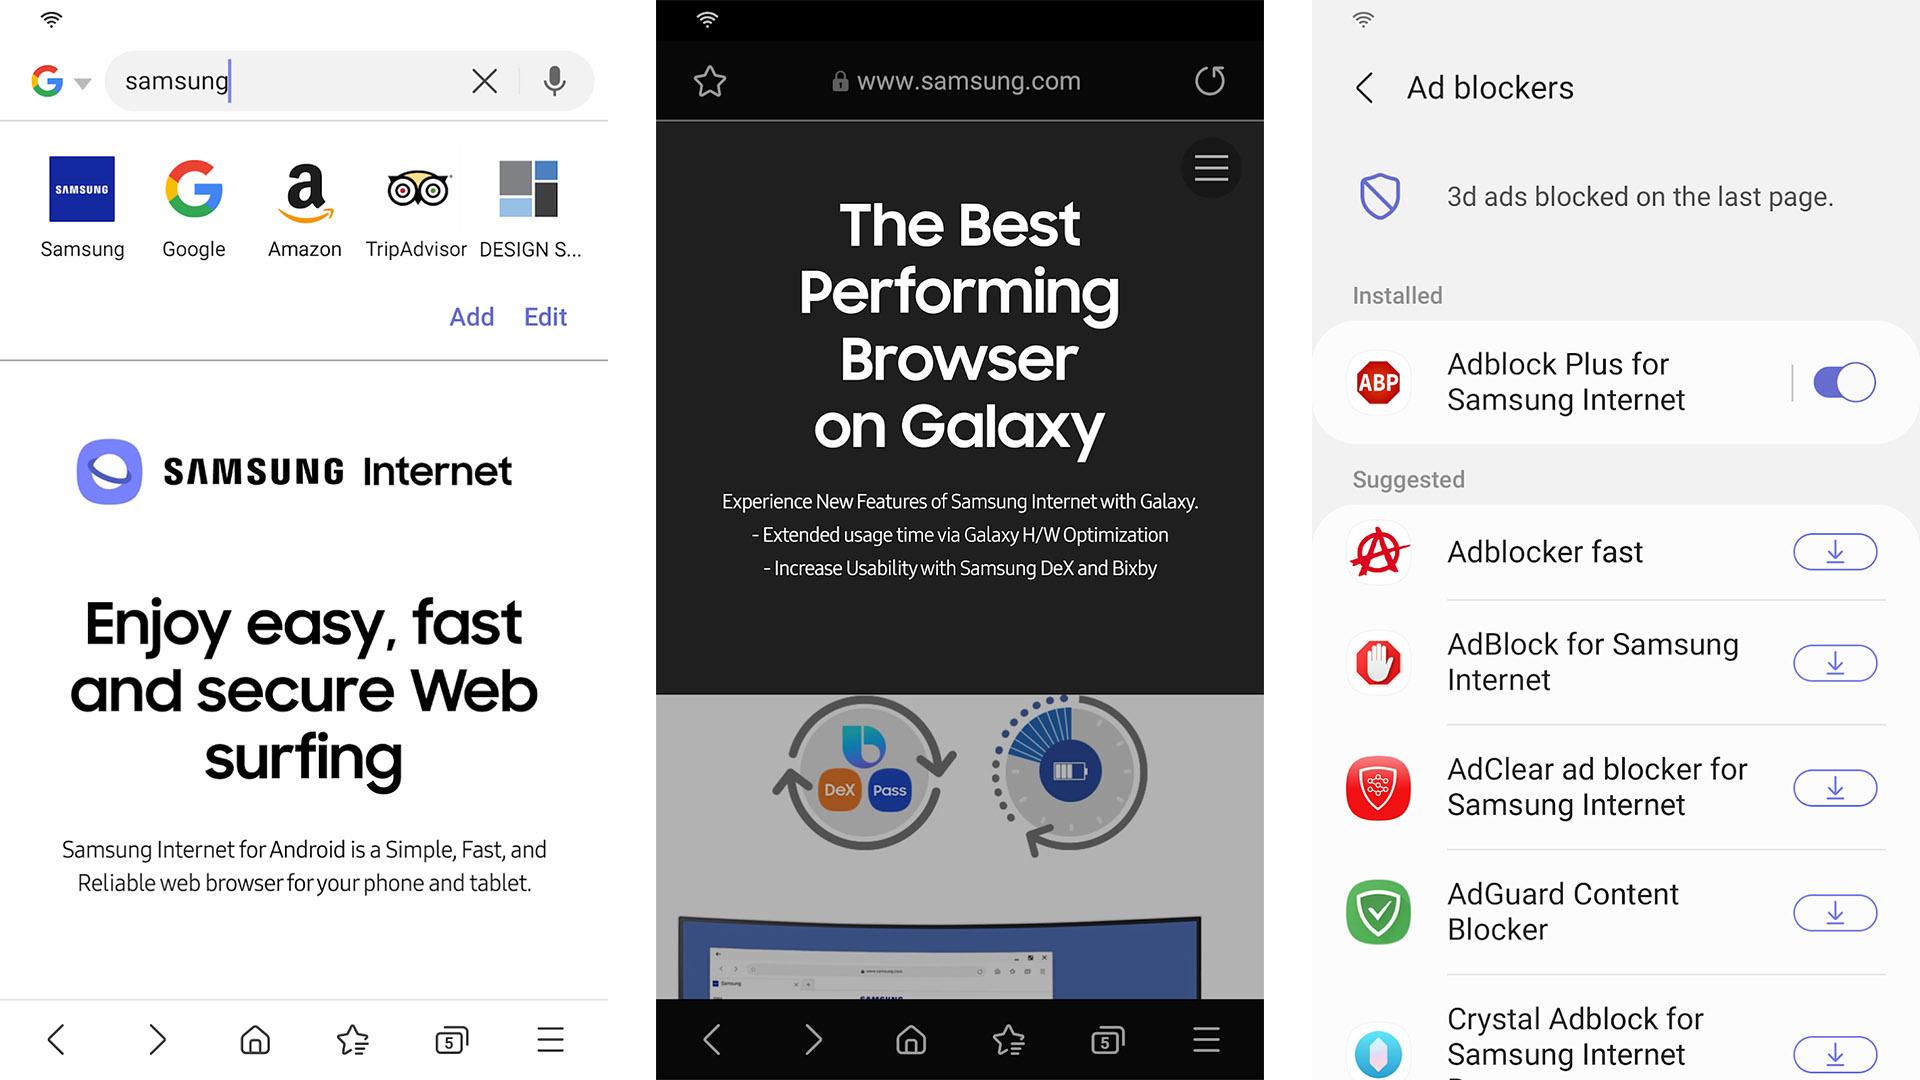 Samsung Internet Browser screenshot 2021